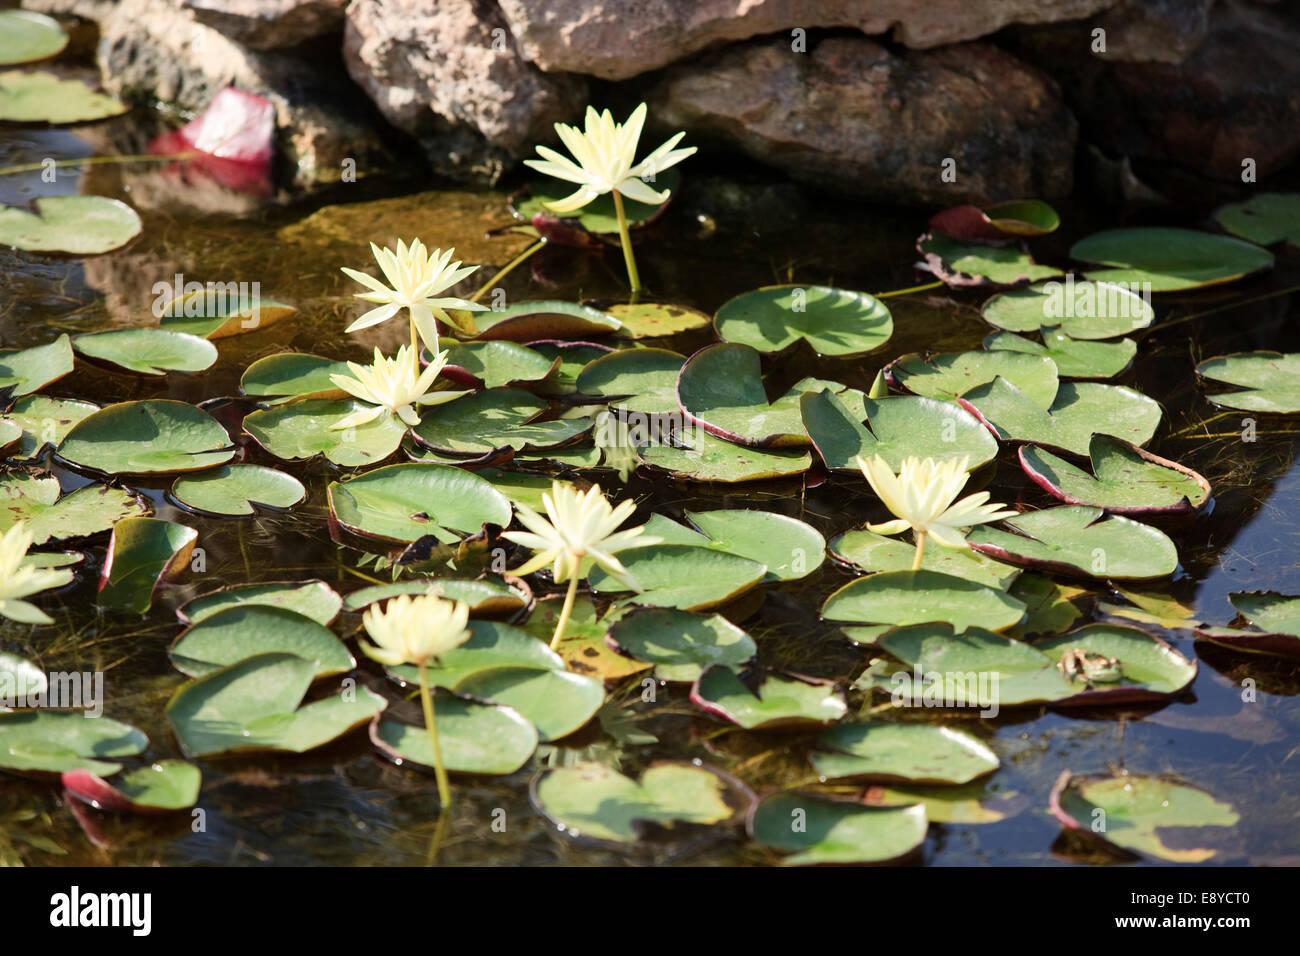 Botanicactus jardín, Jardín Botánico, Ses Salines, Mallorca, Islas Baleares, España. Foto de stock